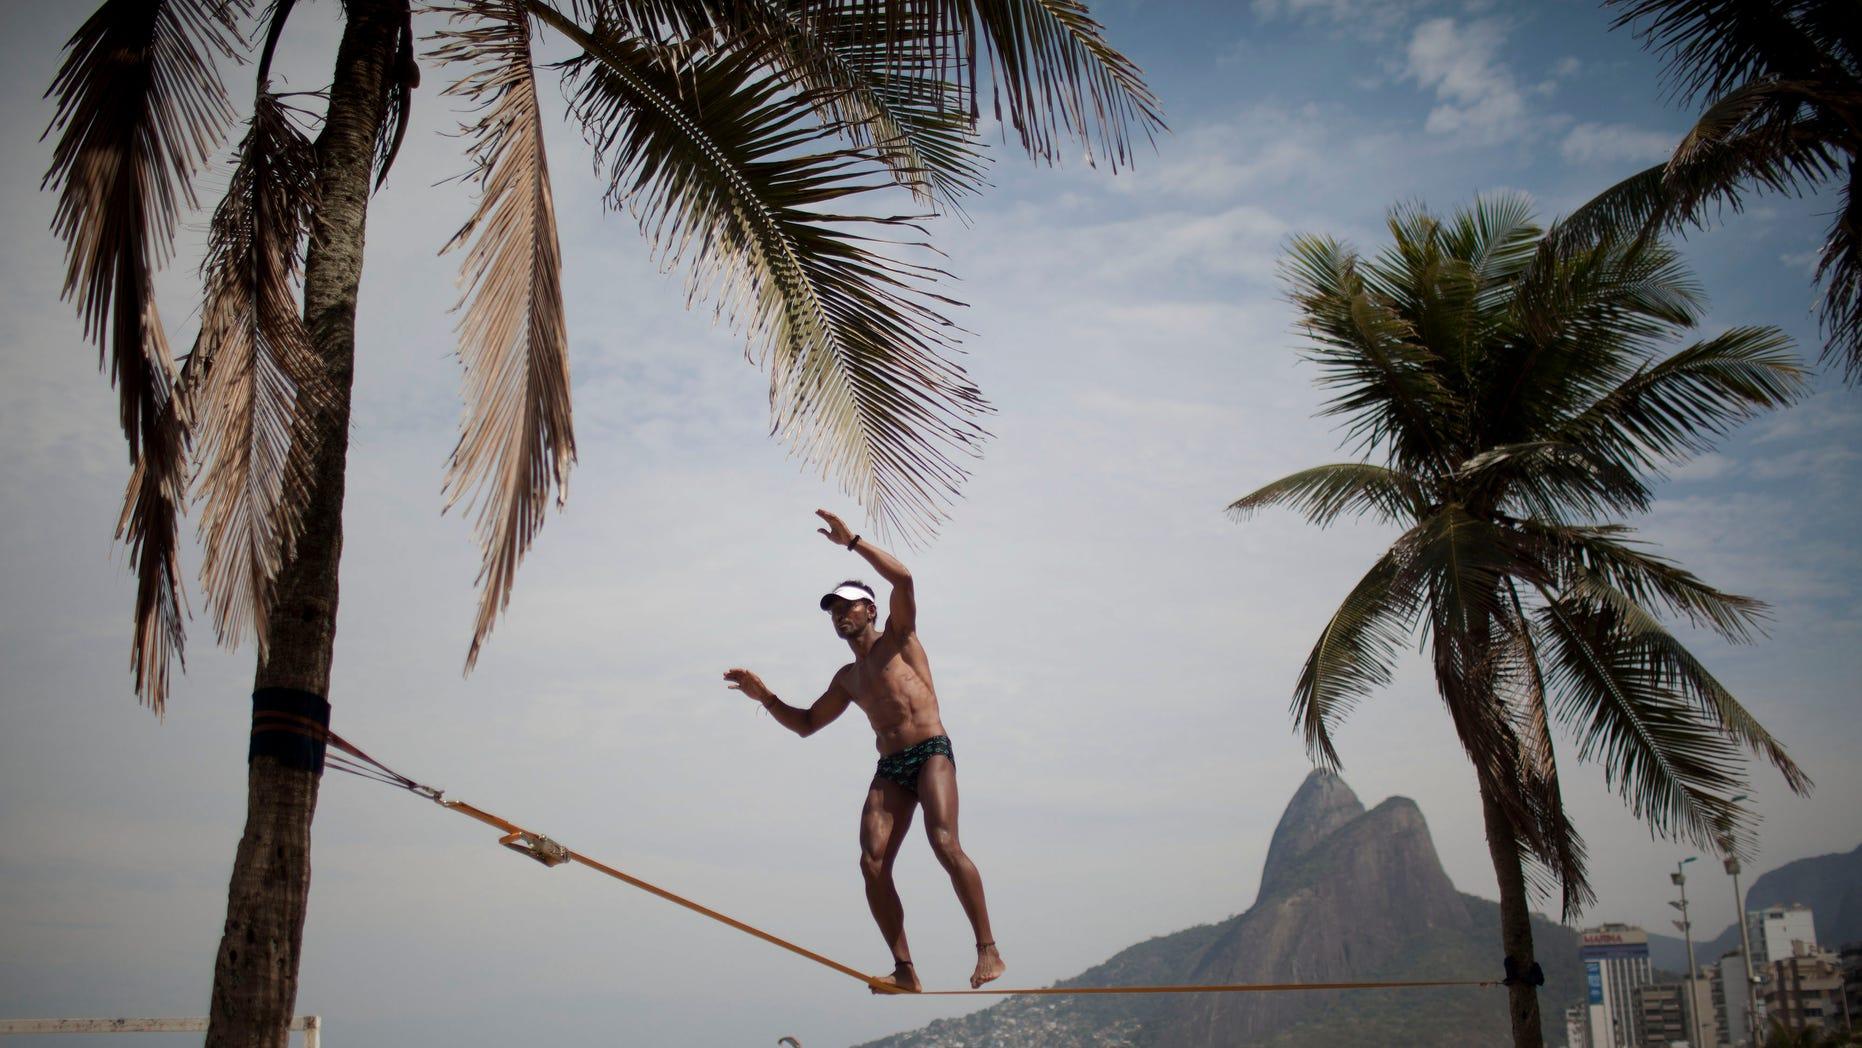 Waltinho da Silva, 48, practices slacklining at Ipanema Beach in Rio de Janeiro, Brazil, Saturday Aug. 20, 2011. (AP Photo/Felipe Dana)